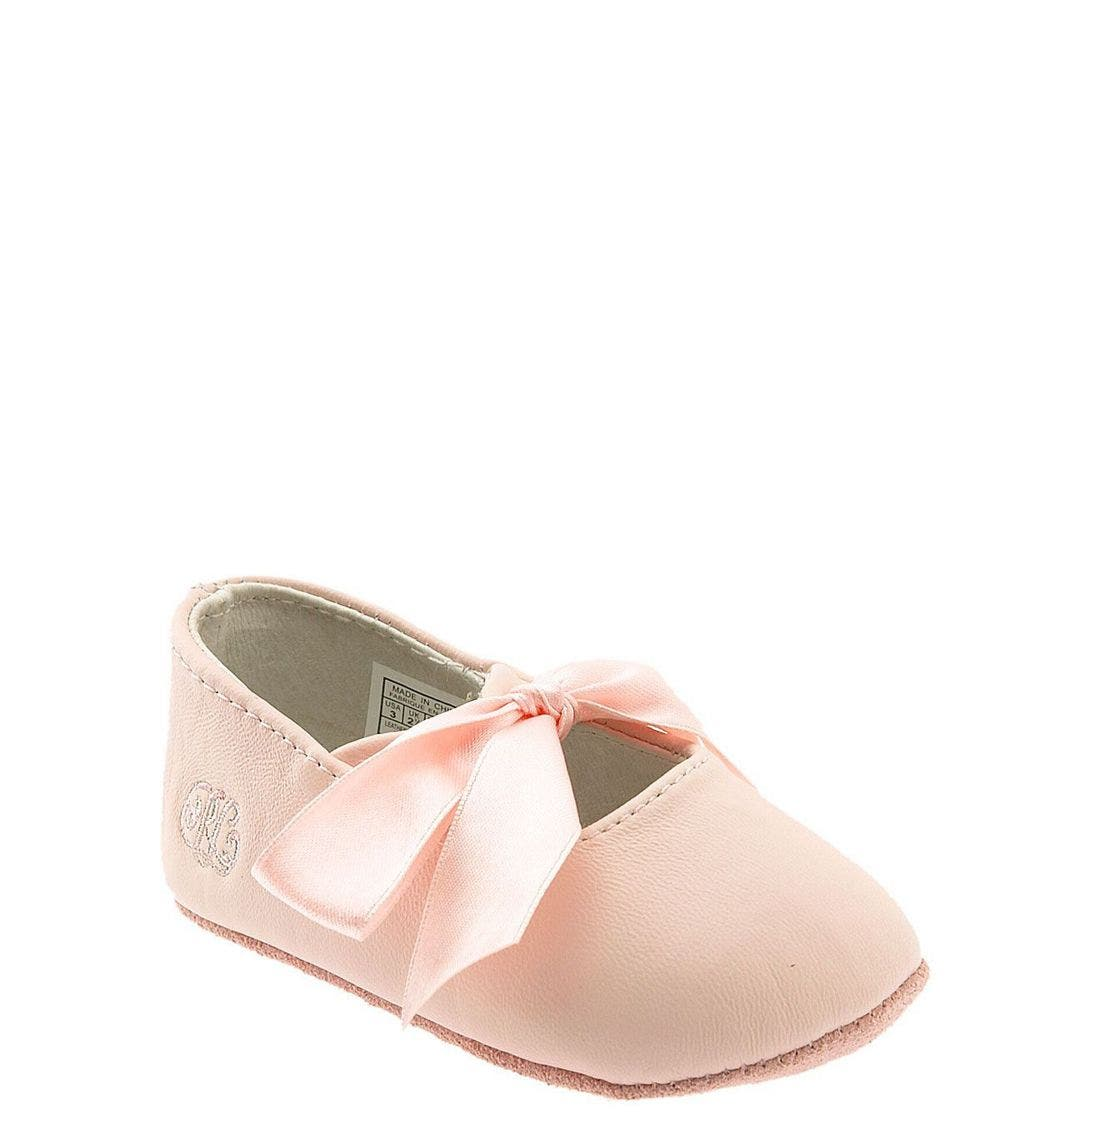 Alternate Image 1 Selected - Ralph Lauren Layette 'Briley' Shoe (Baby)